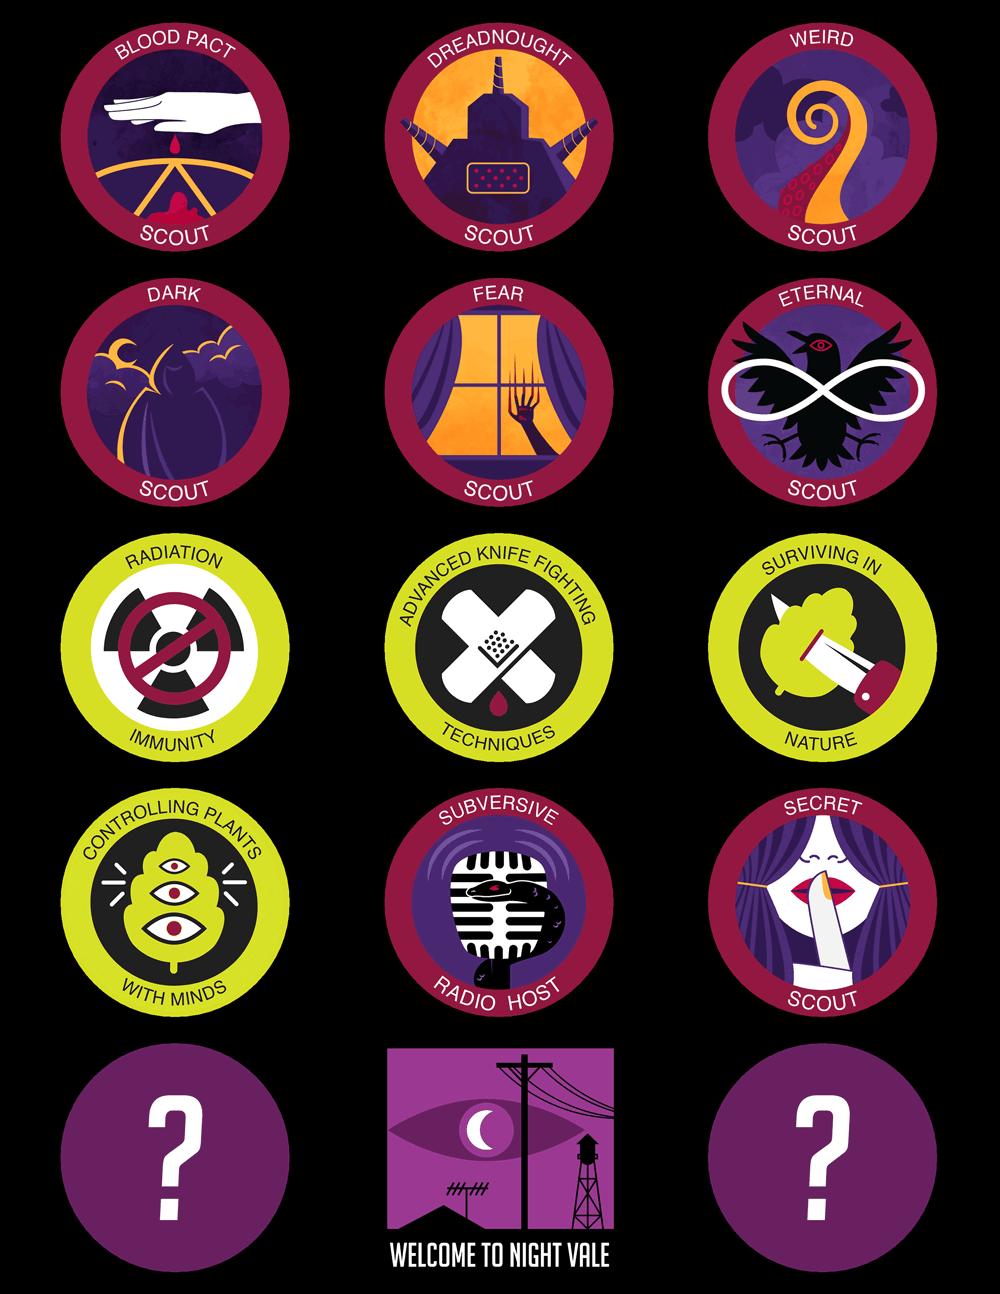 cpb-wtnv-scout-sheet2.png